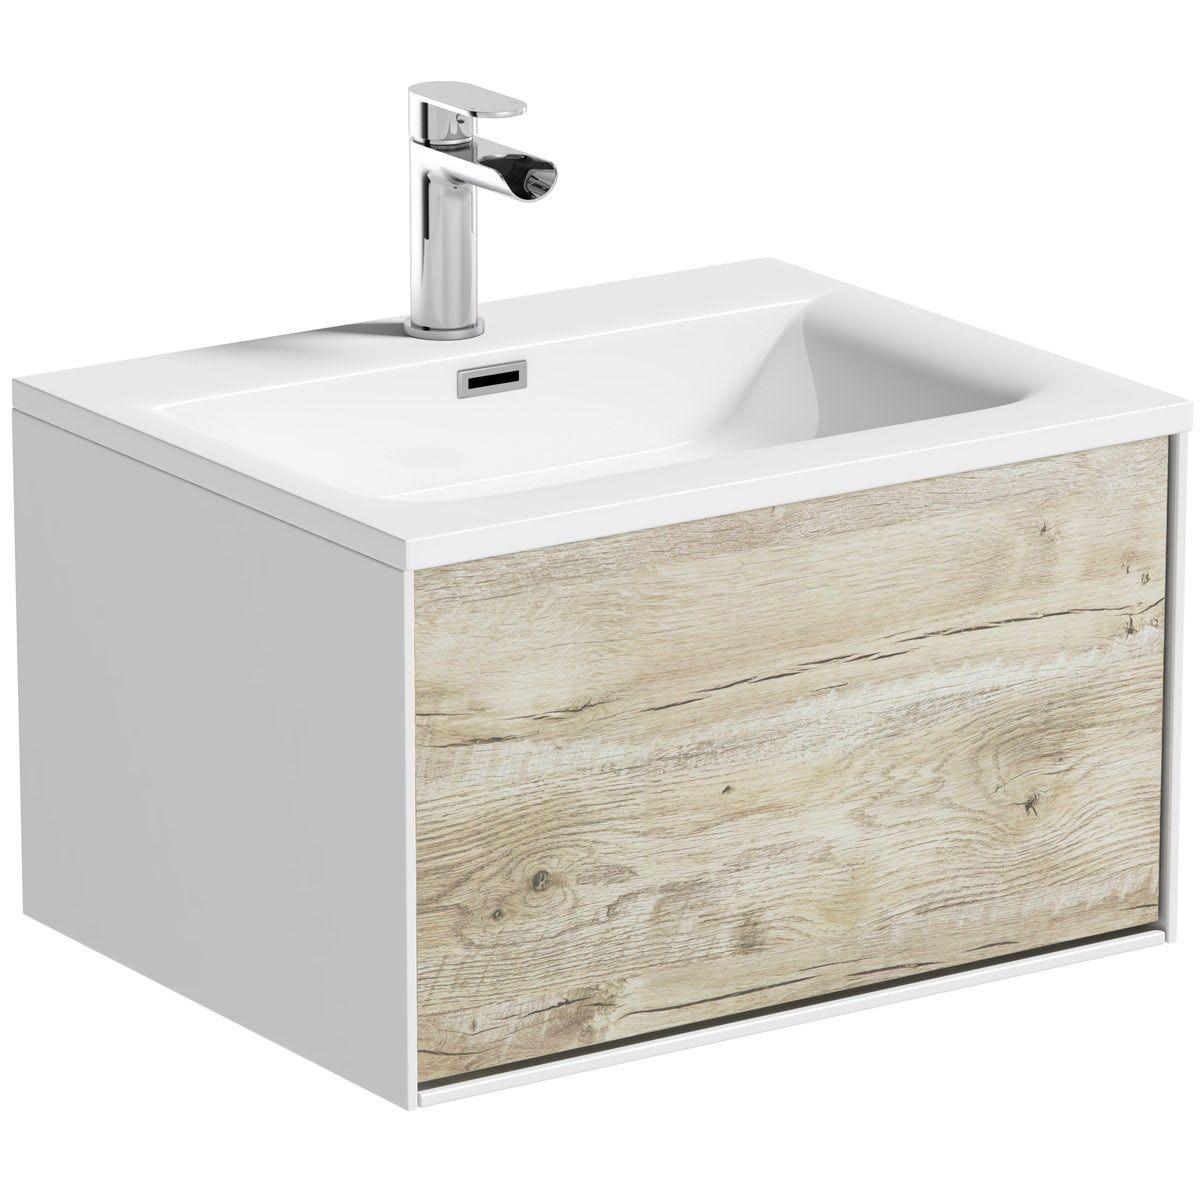 Mode Burton White Rustic Oak Wall Hung Vanity Unit And Basin 600mm Wall Hung Vanity Vanity Units Vanity